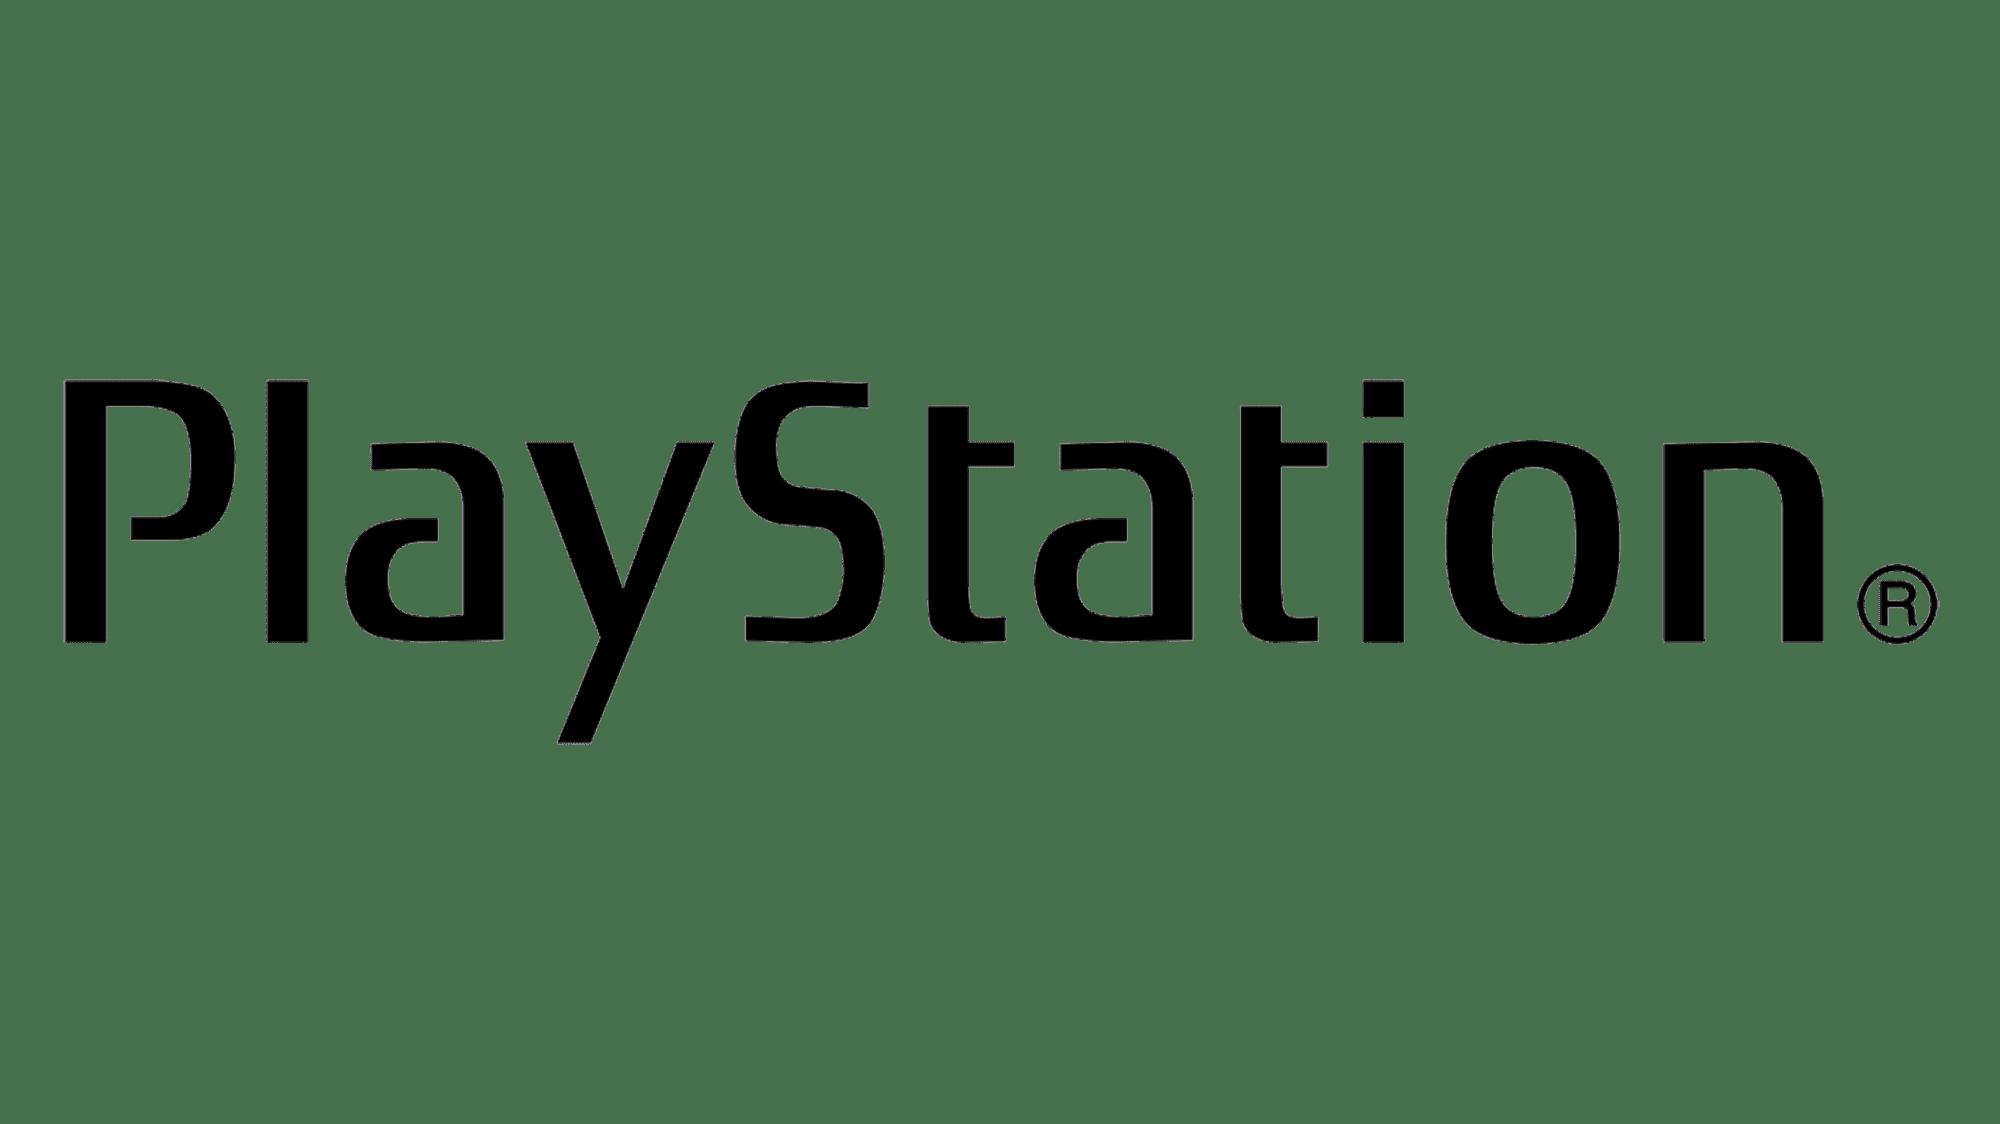 PlayStation font